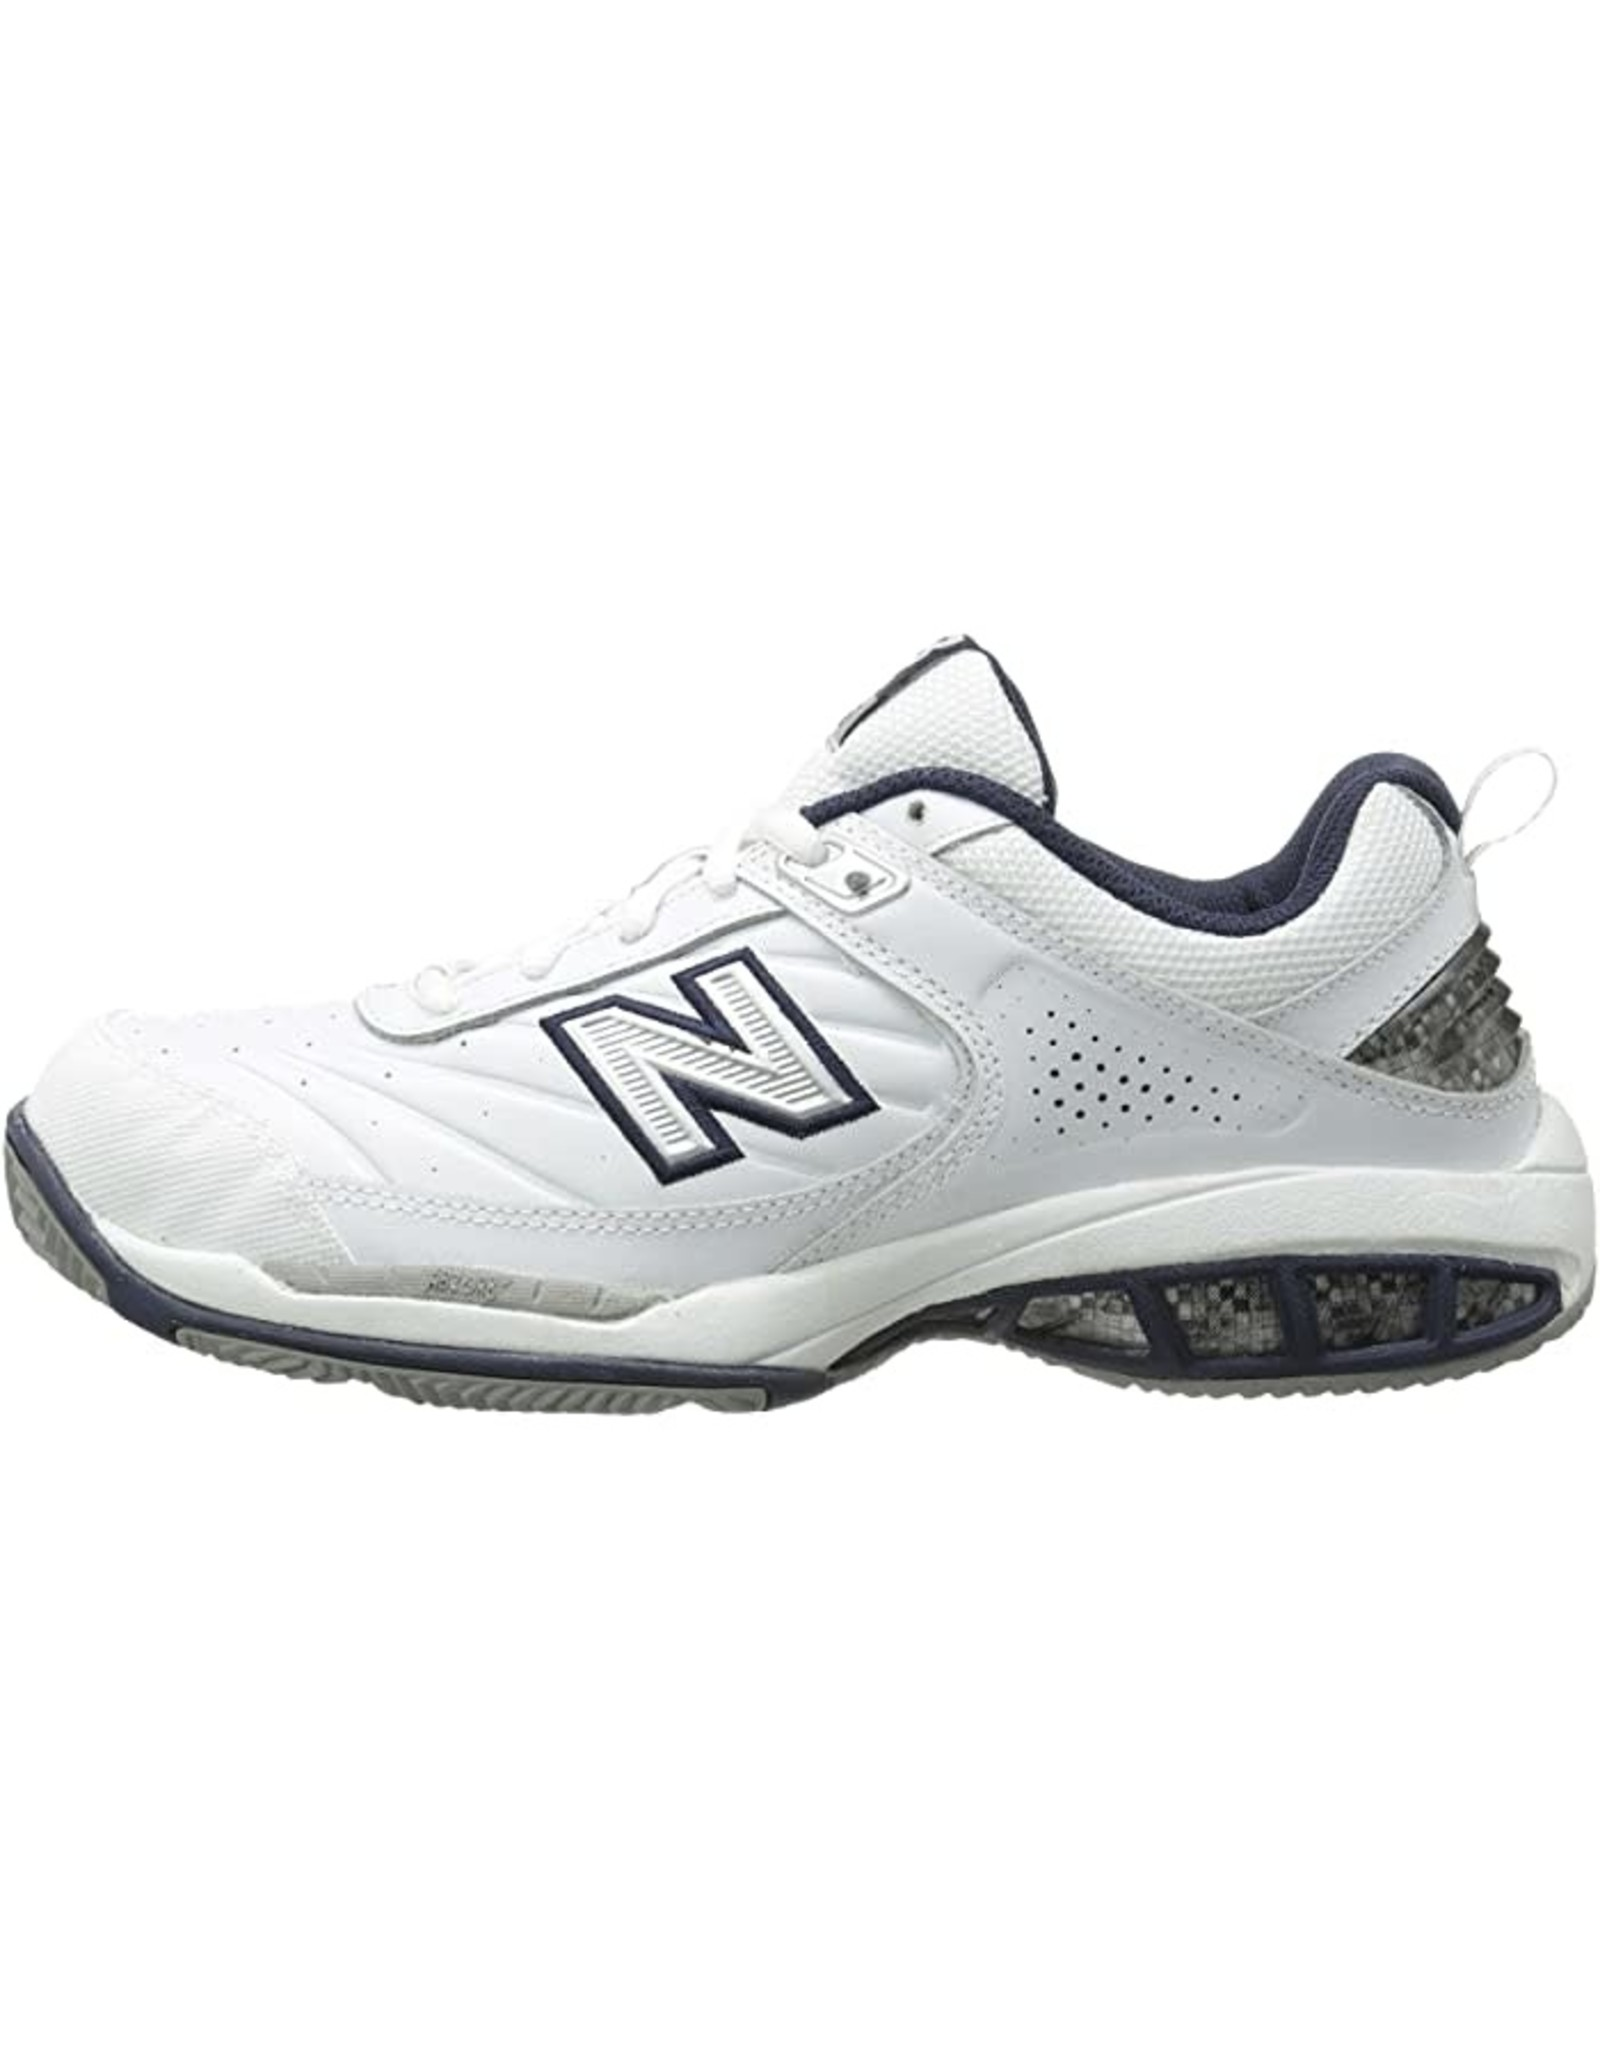 New Balance New Balance MC806W Men's Tennis Shoe